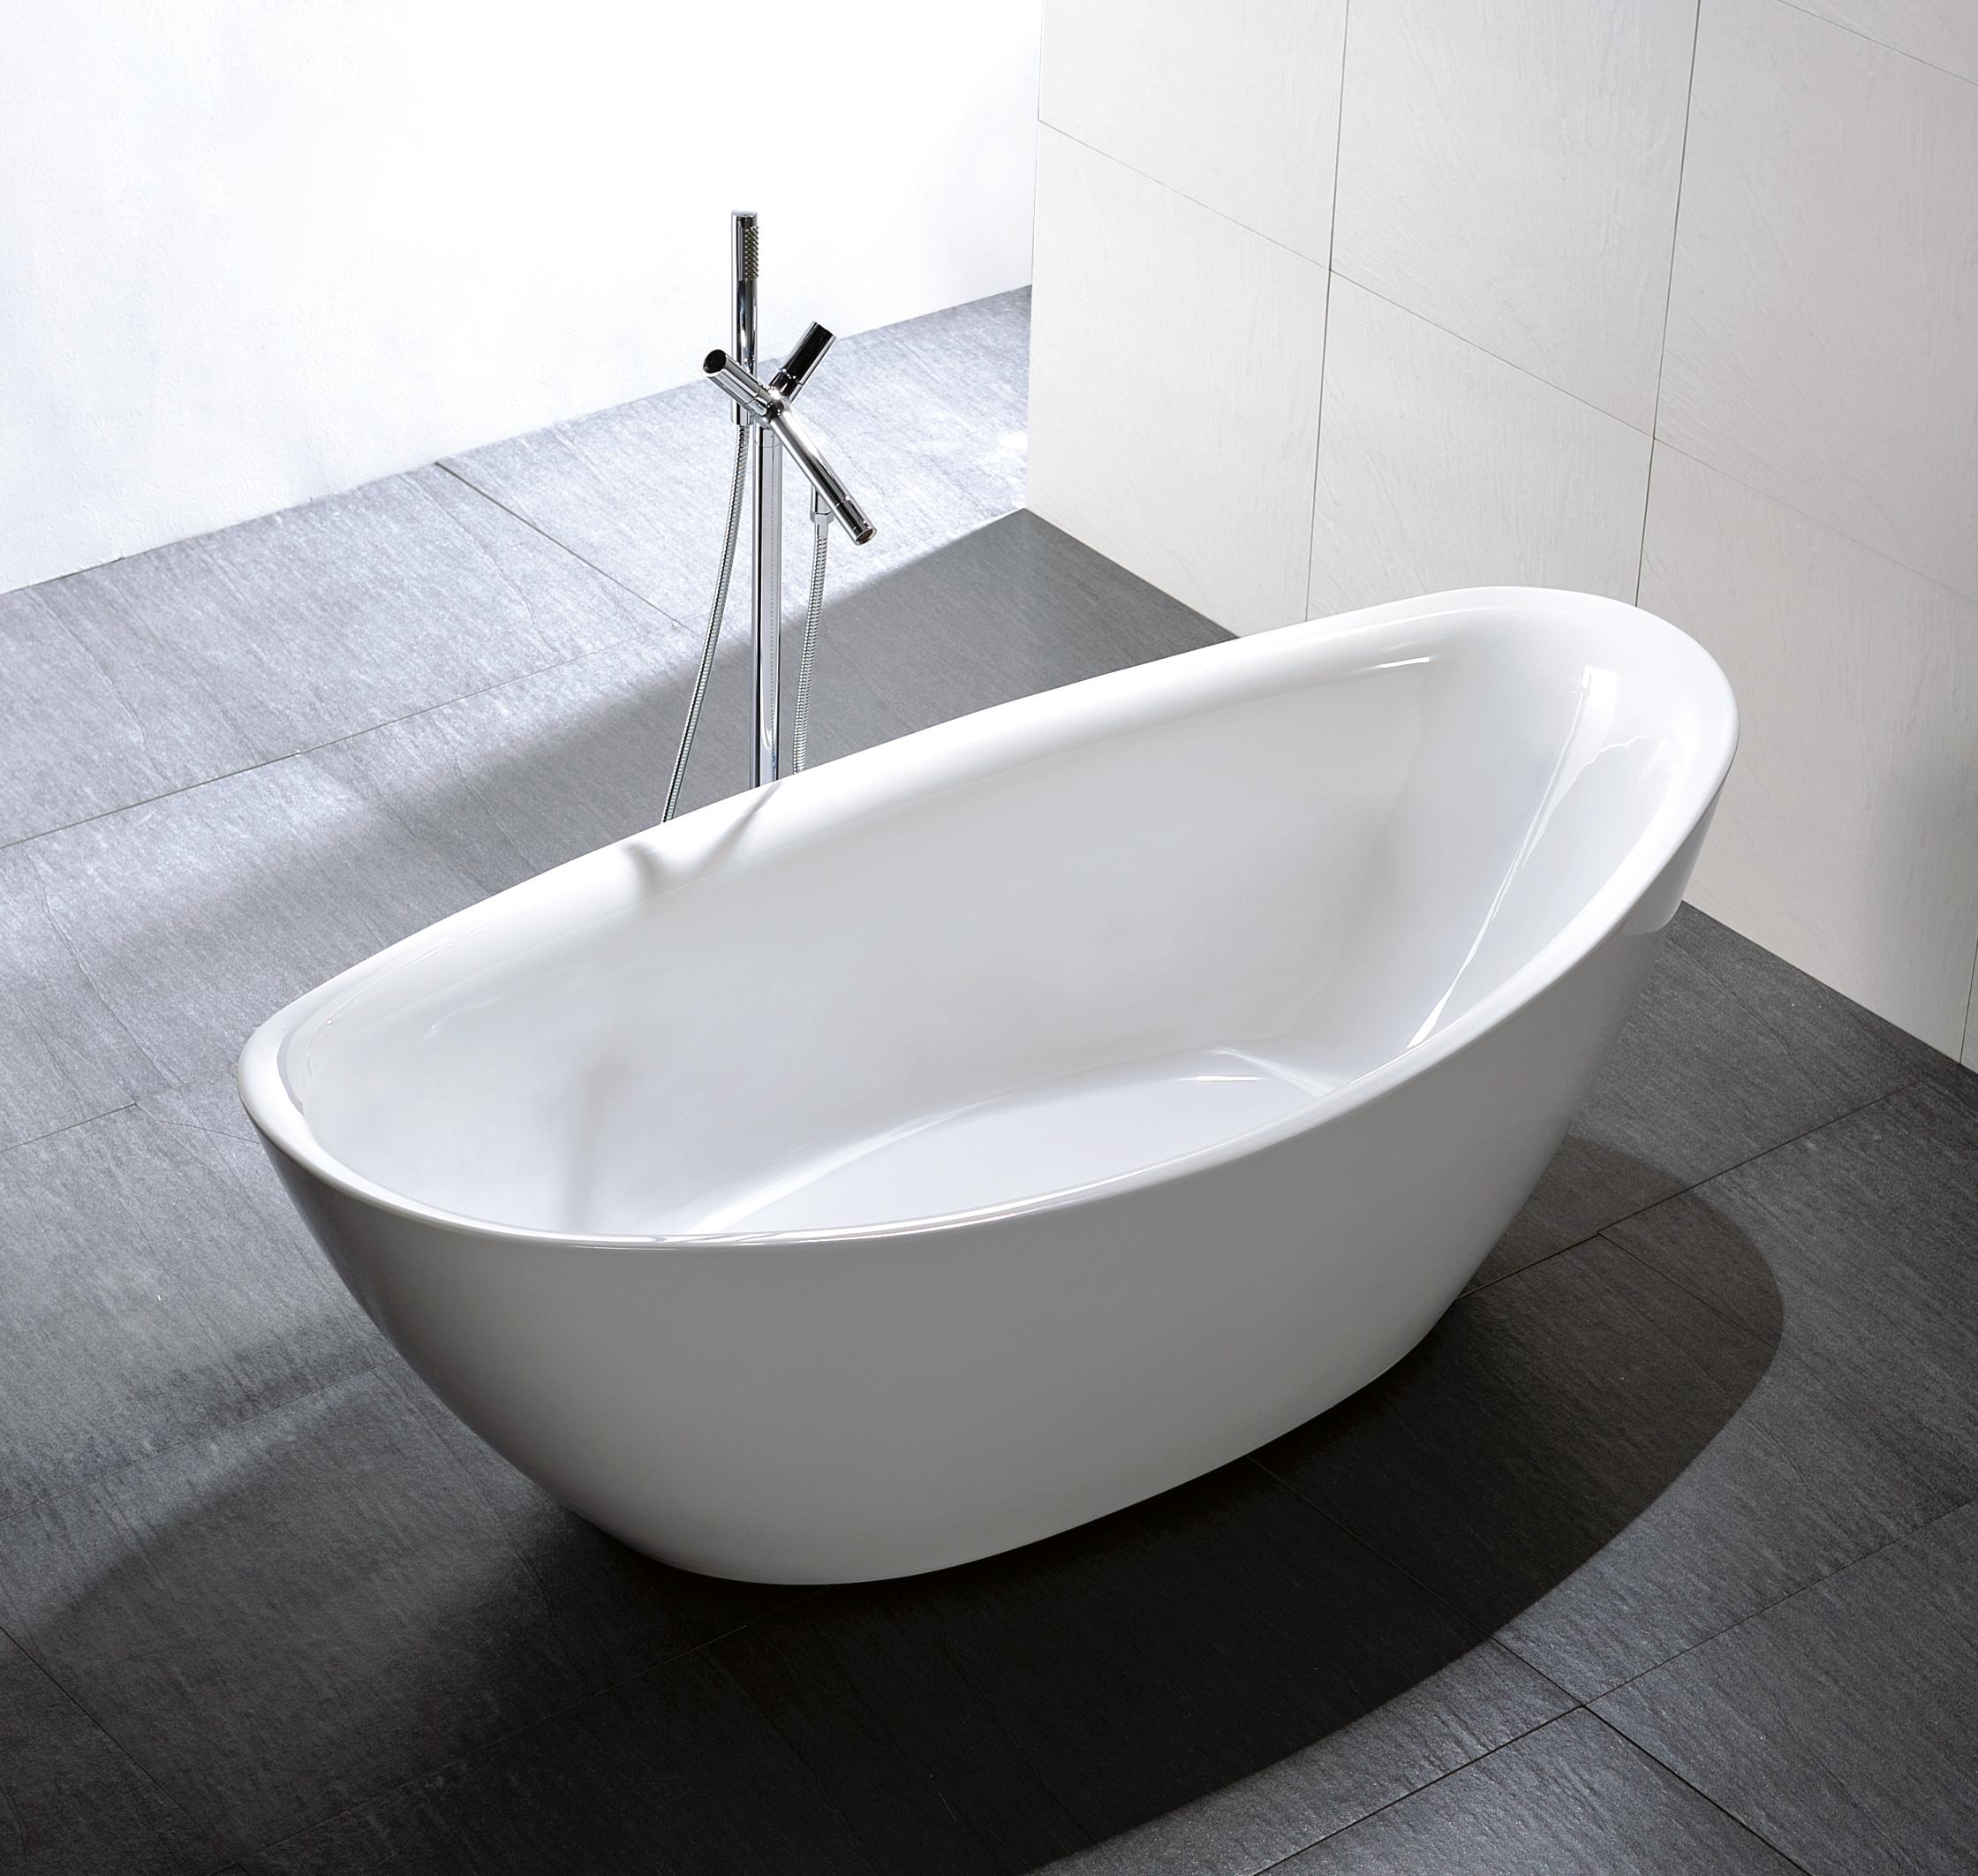 Vasca da bagno freestanding vasca da bagno bellagio con - Vasca da bagno freestanding ...